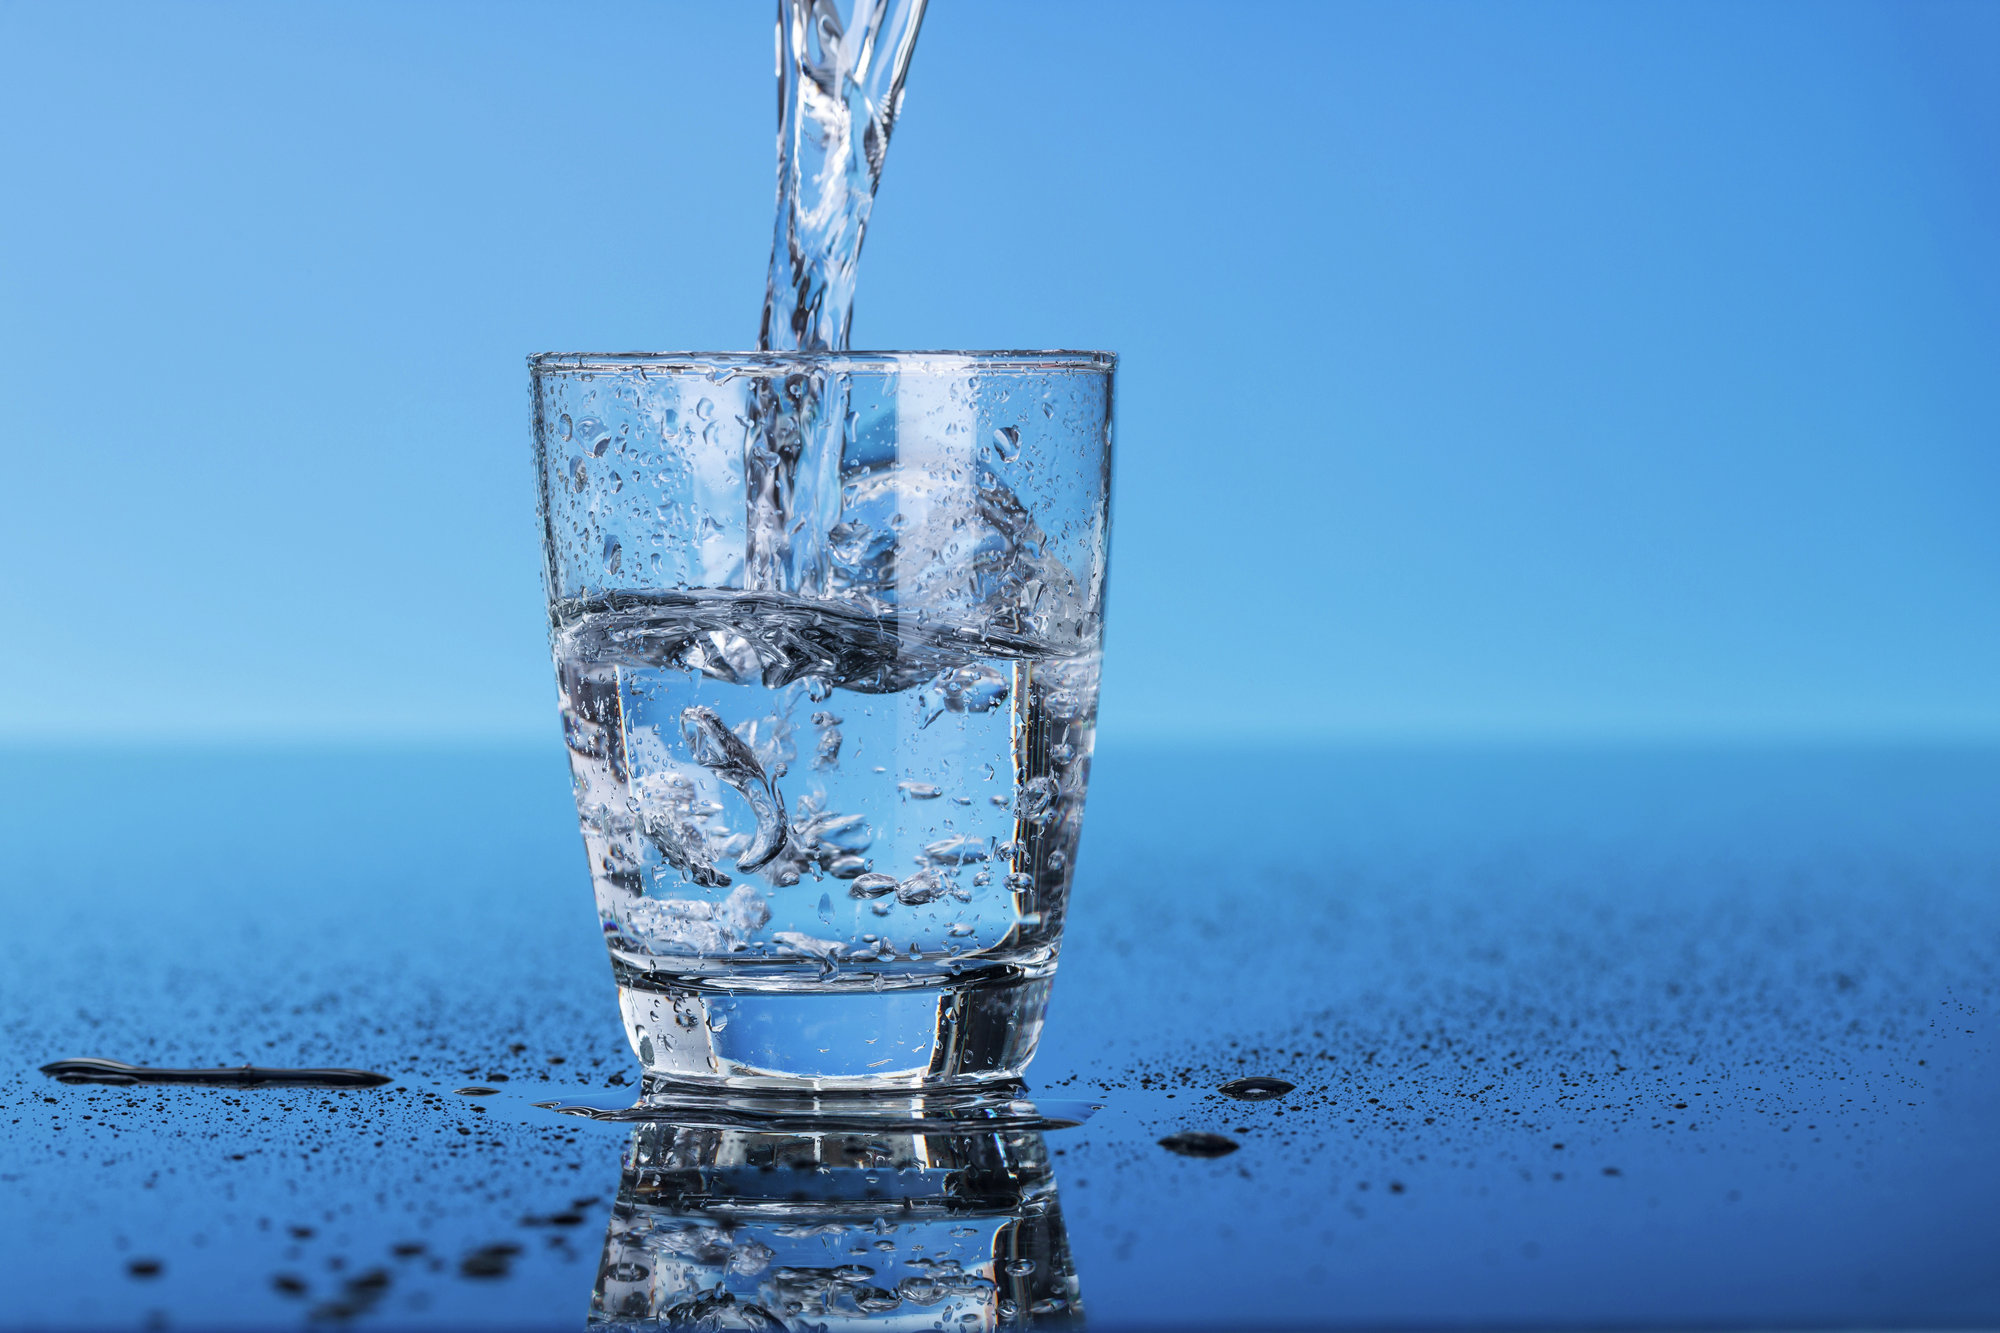 Пейте чистую воду от «Аква Голд»!